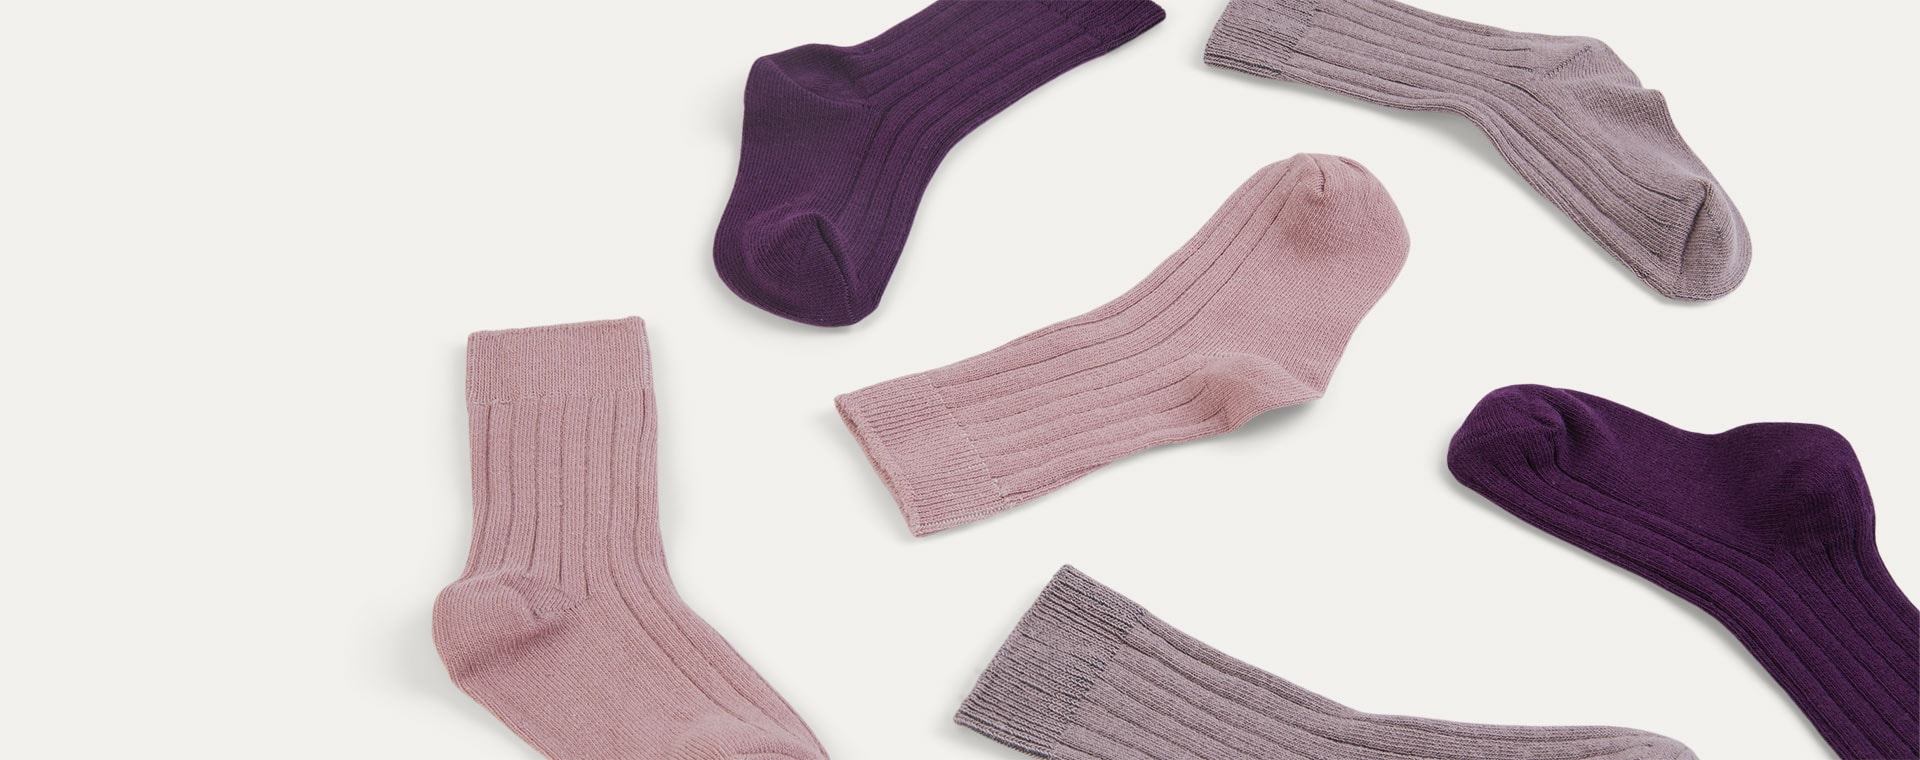 Peony Mix KIDLY Label 3-Pack Socks